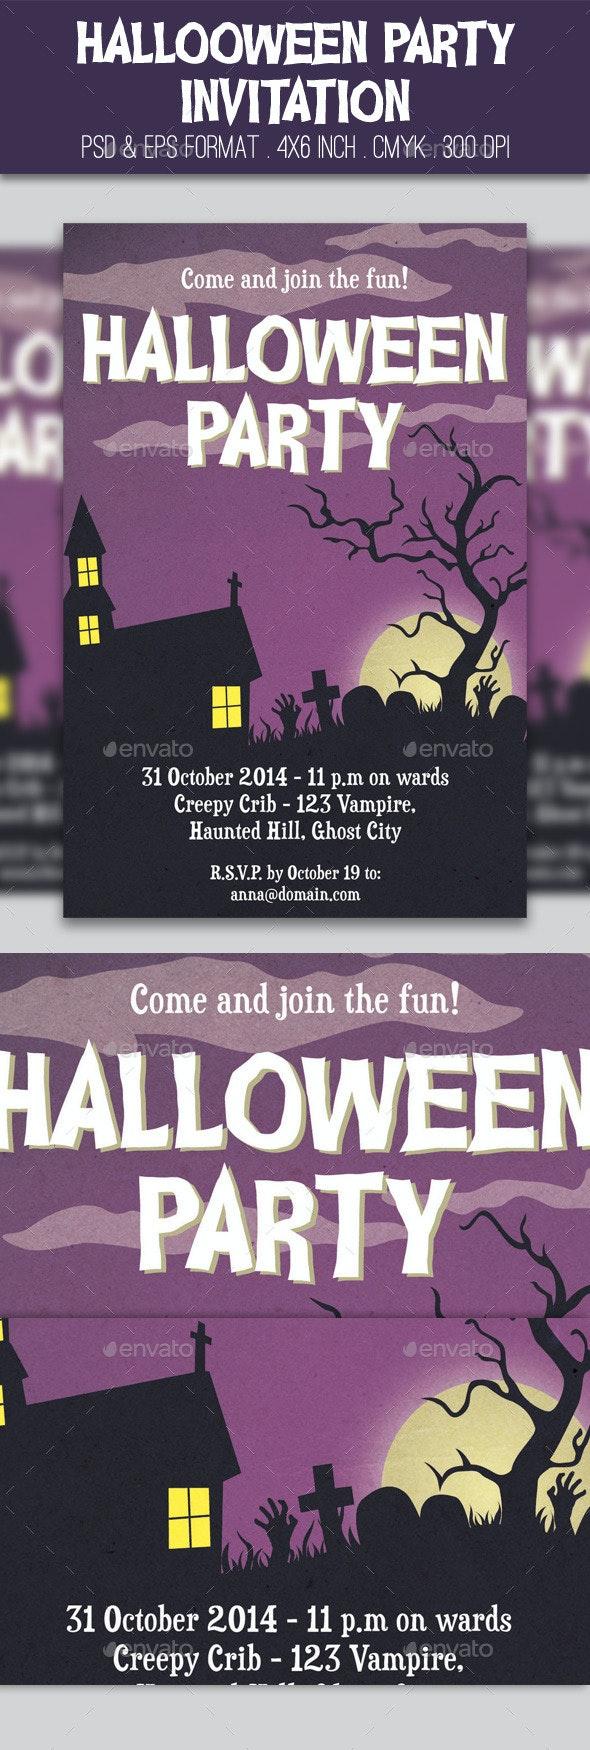 Halloween Party Invitation - Invitations Cards & Invites